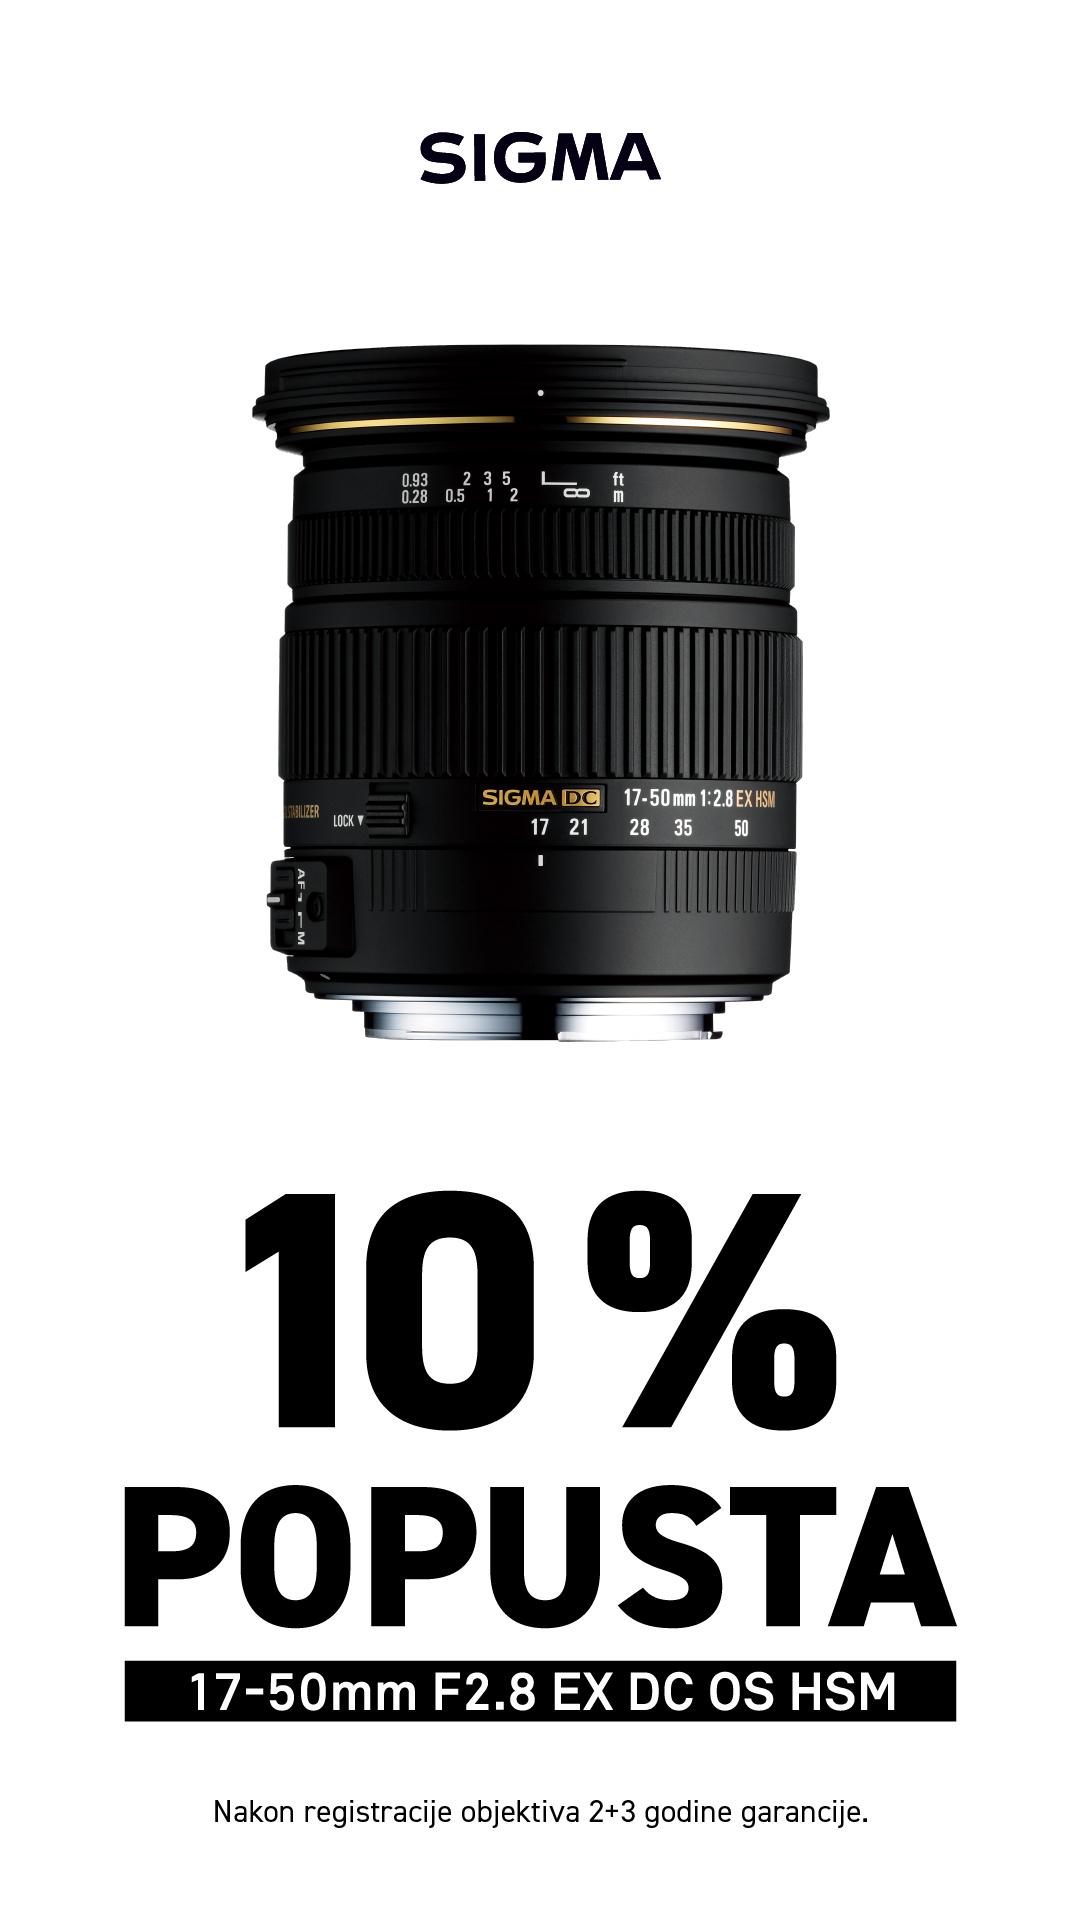 10% popusta na Sigma 17-50mm objektiv